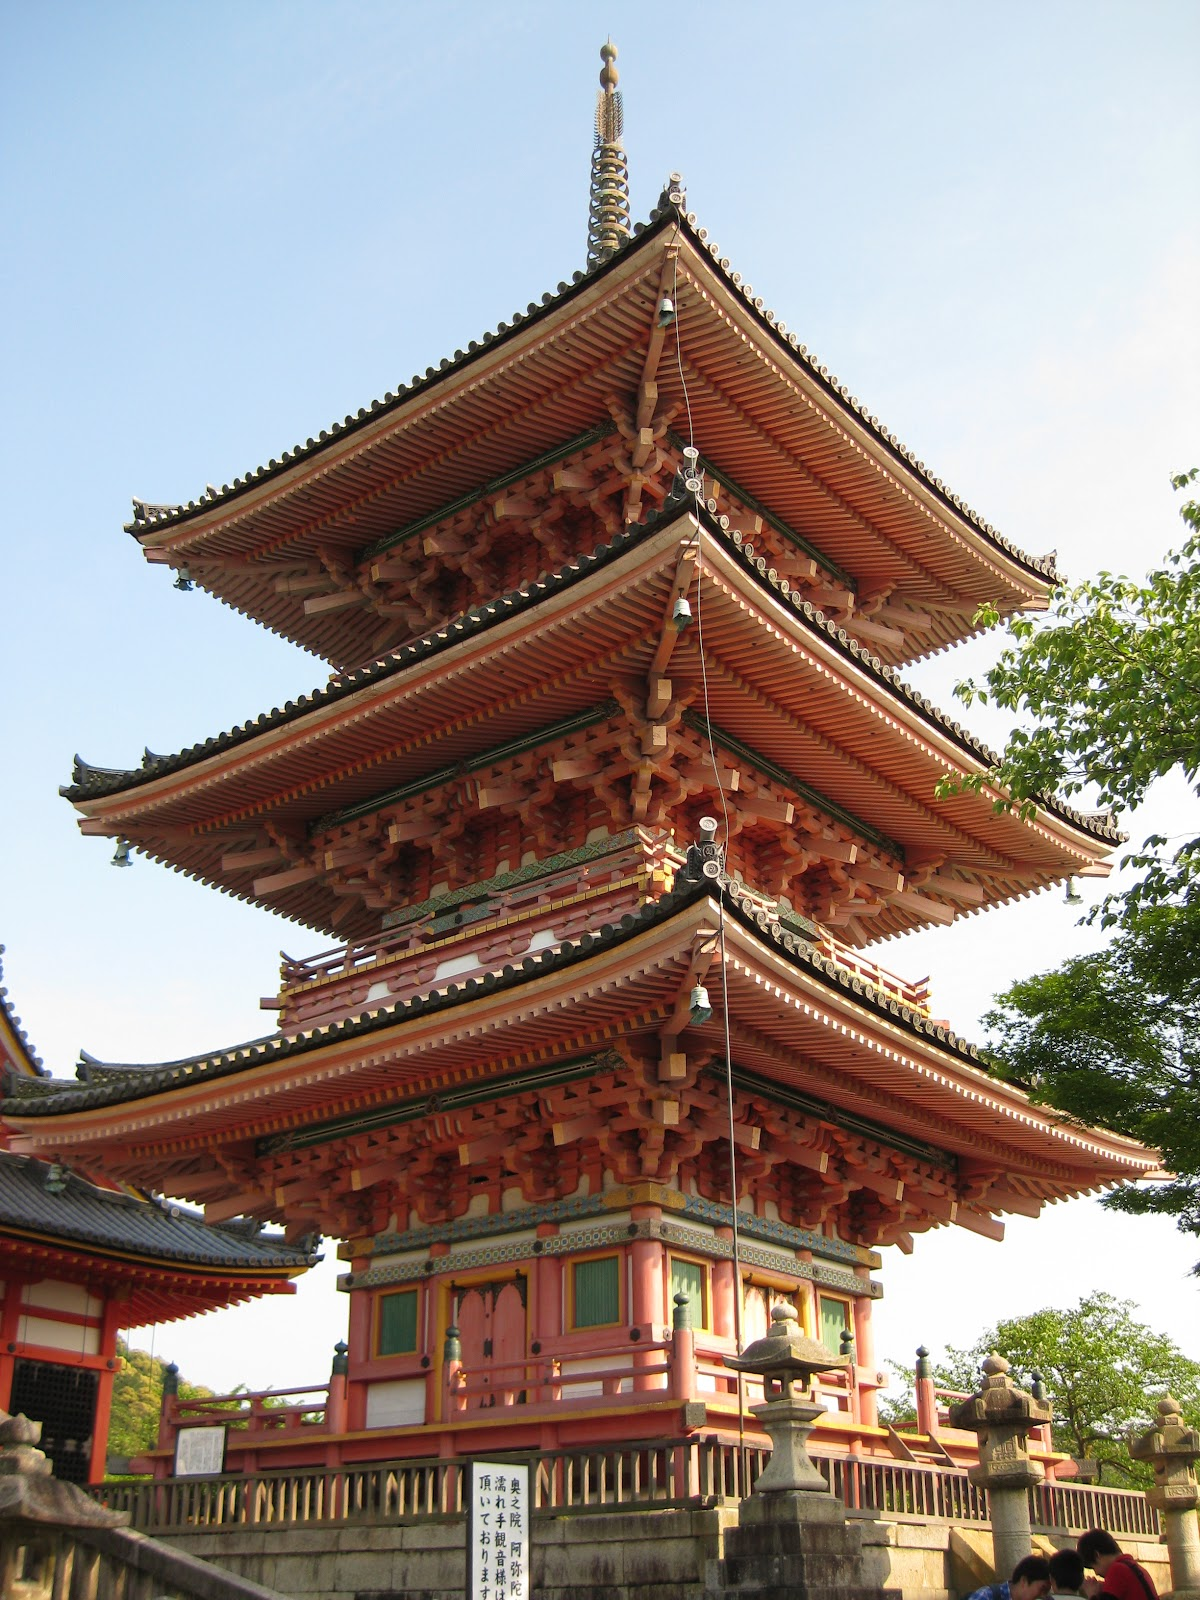 arquitectura japonesa arquitectura japonesa i